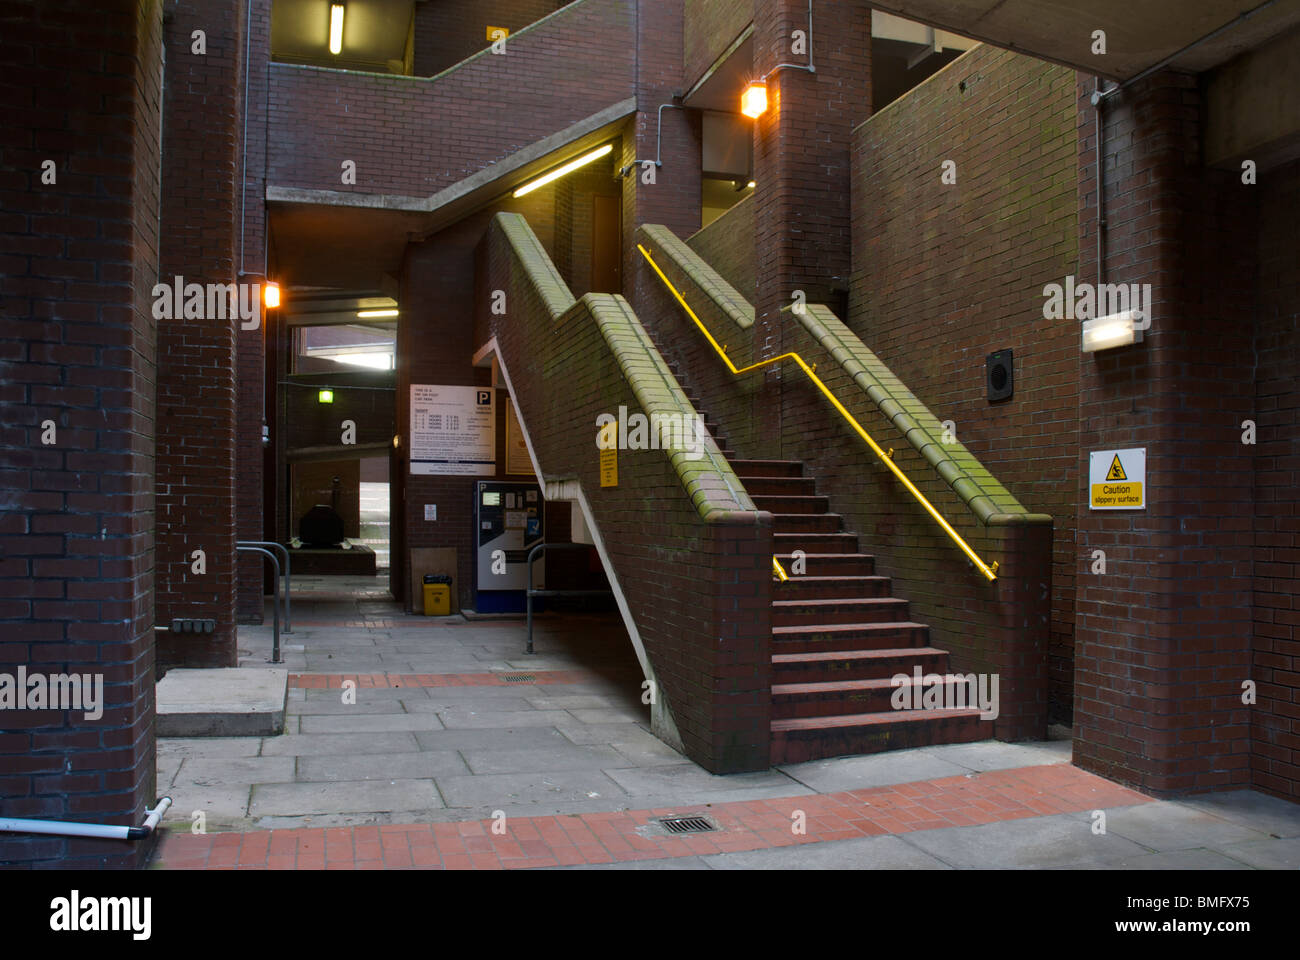 Stairs inside multi-story car-park, Whitehaven, Cumbria, England uk - Stock Image